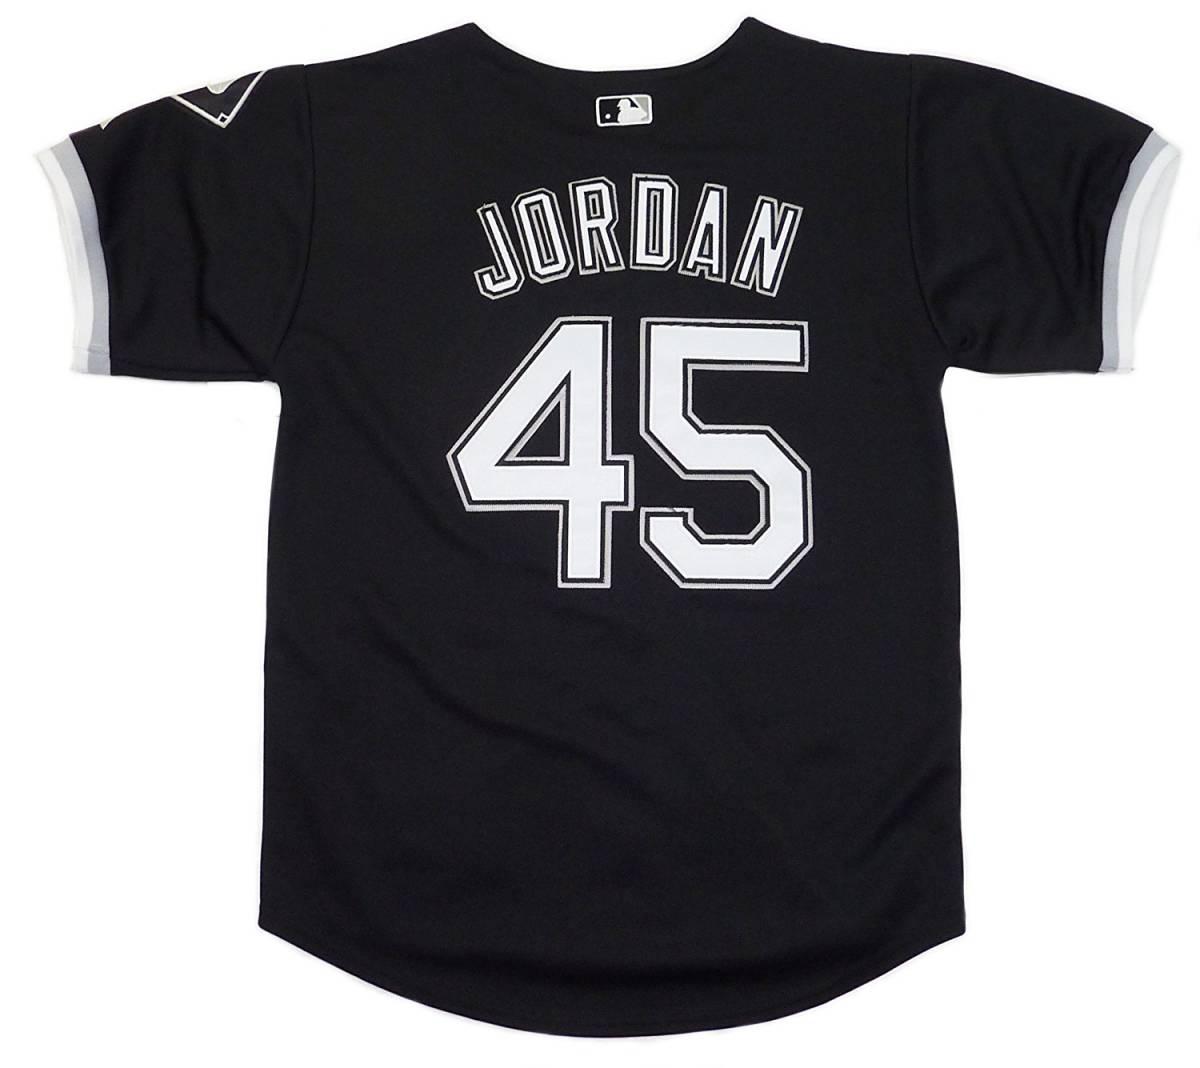 Majestic マジェスティック クーパースタウン マイケル ジョーダン ホワイト ソックス ベースボールシャツ(ブラック)(L)【並行輸入品】 _画像2